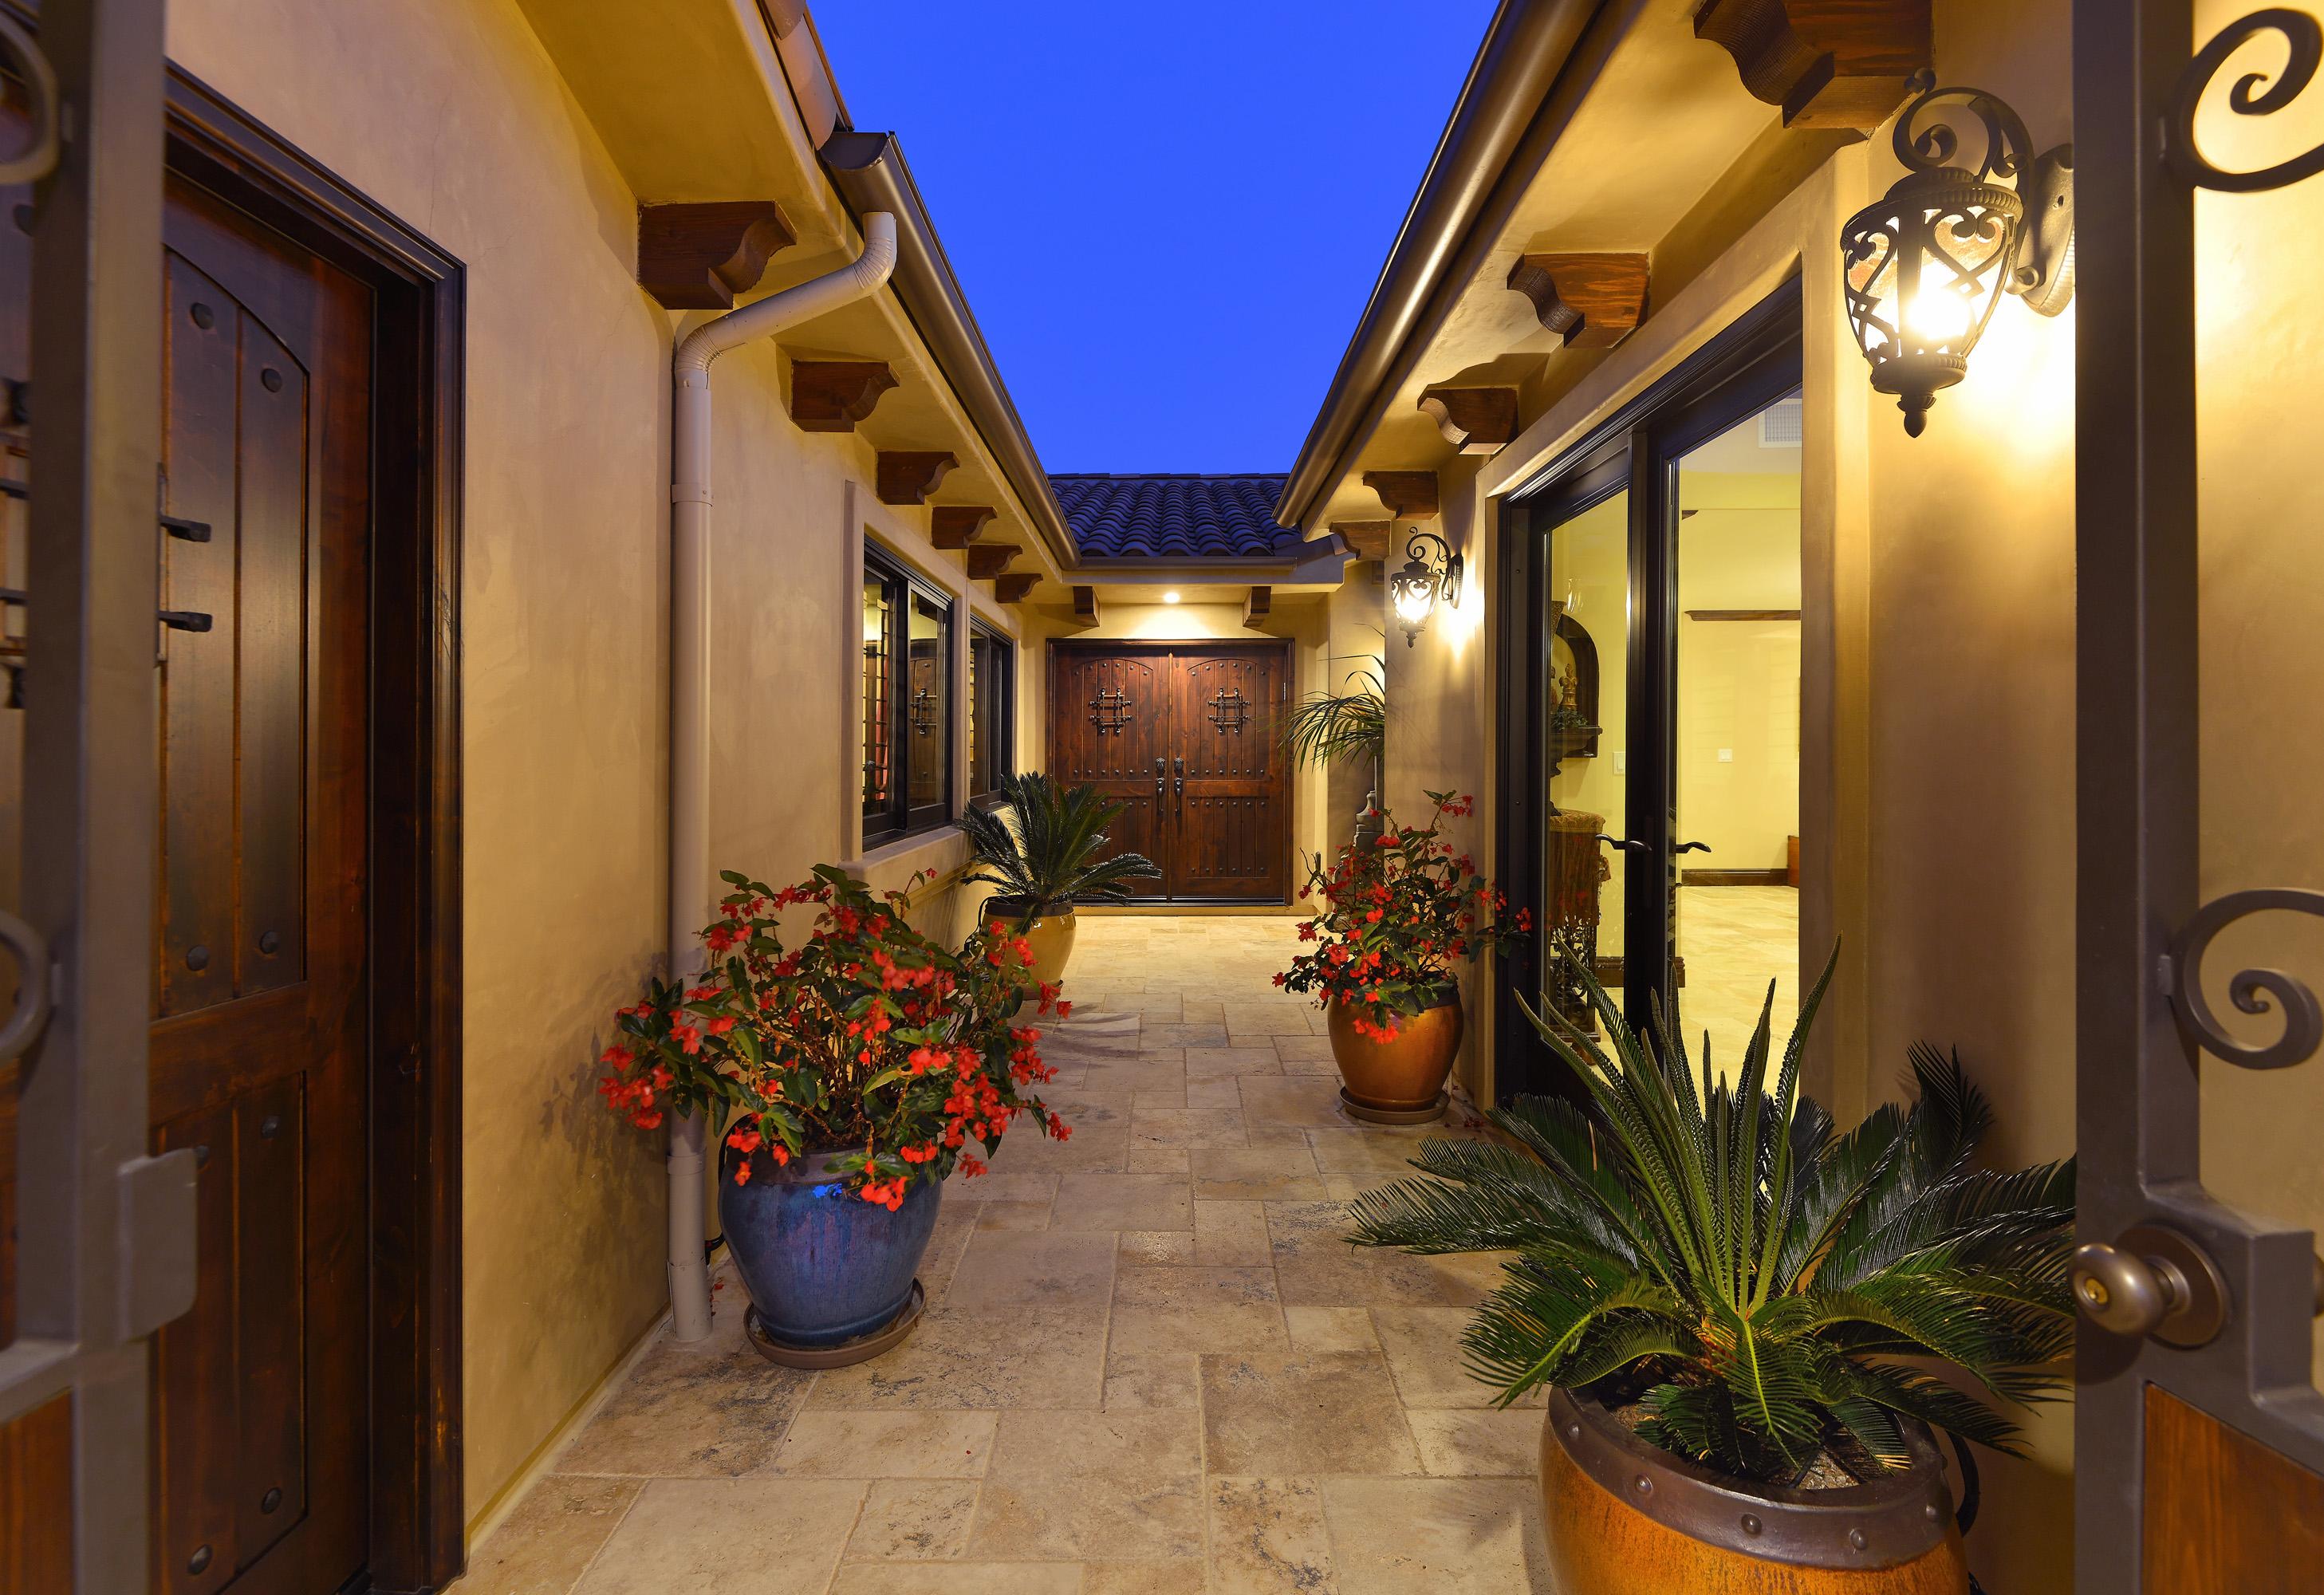 1683 Calle De Primra -  La Jolla, CA 92037